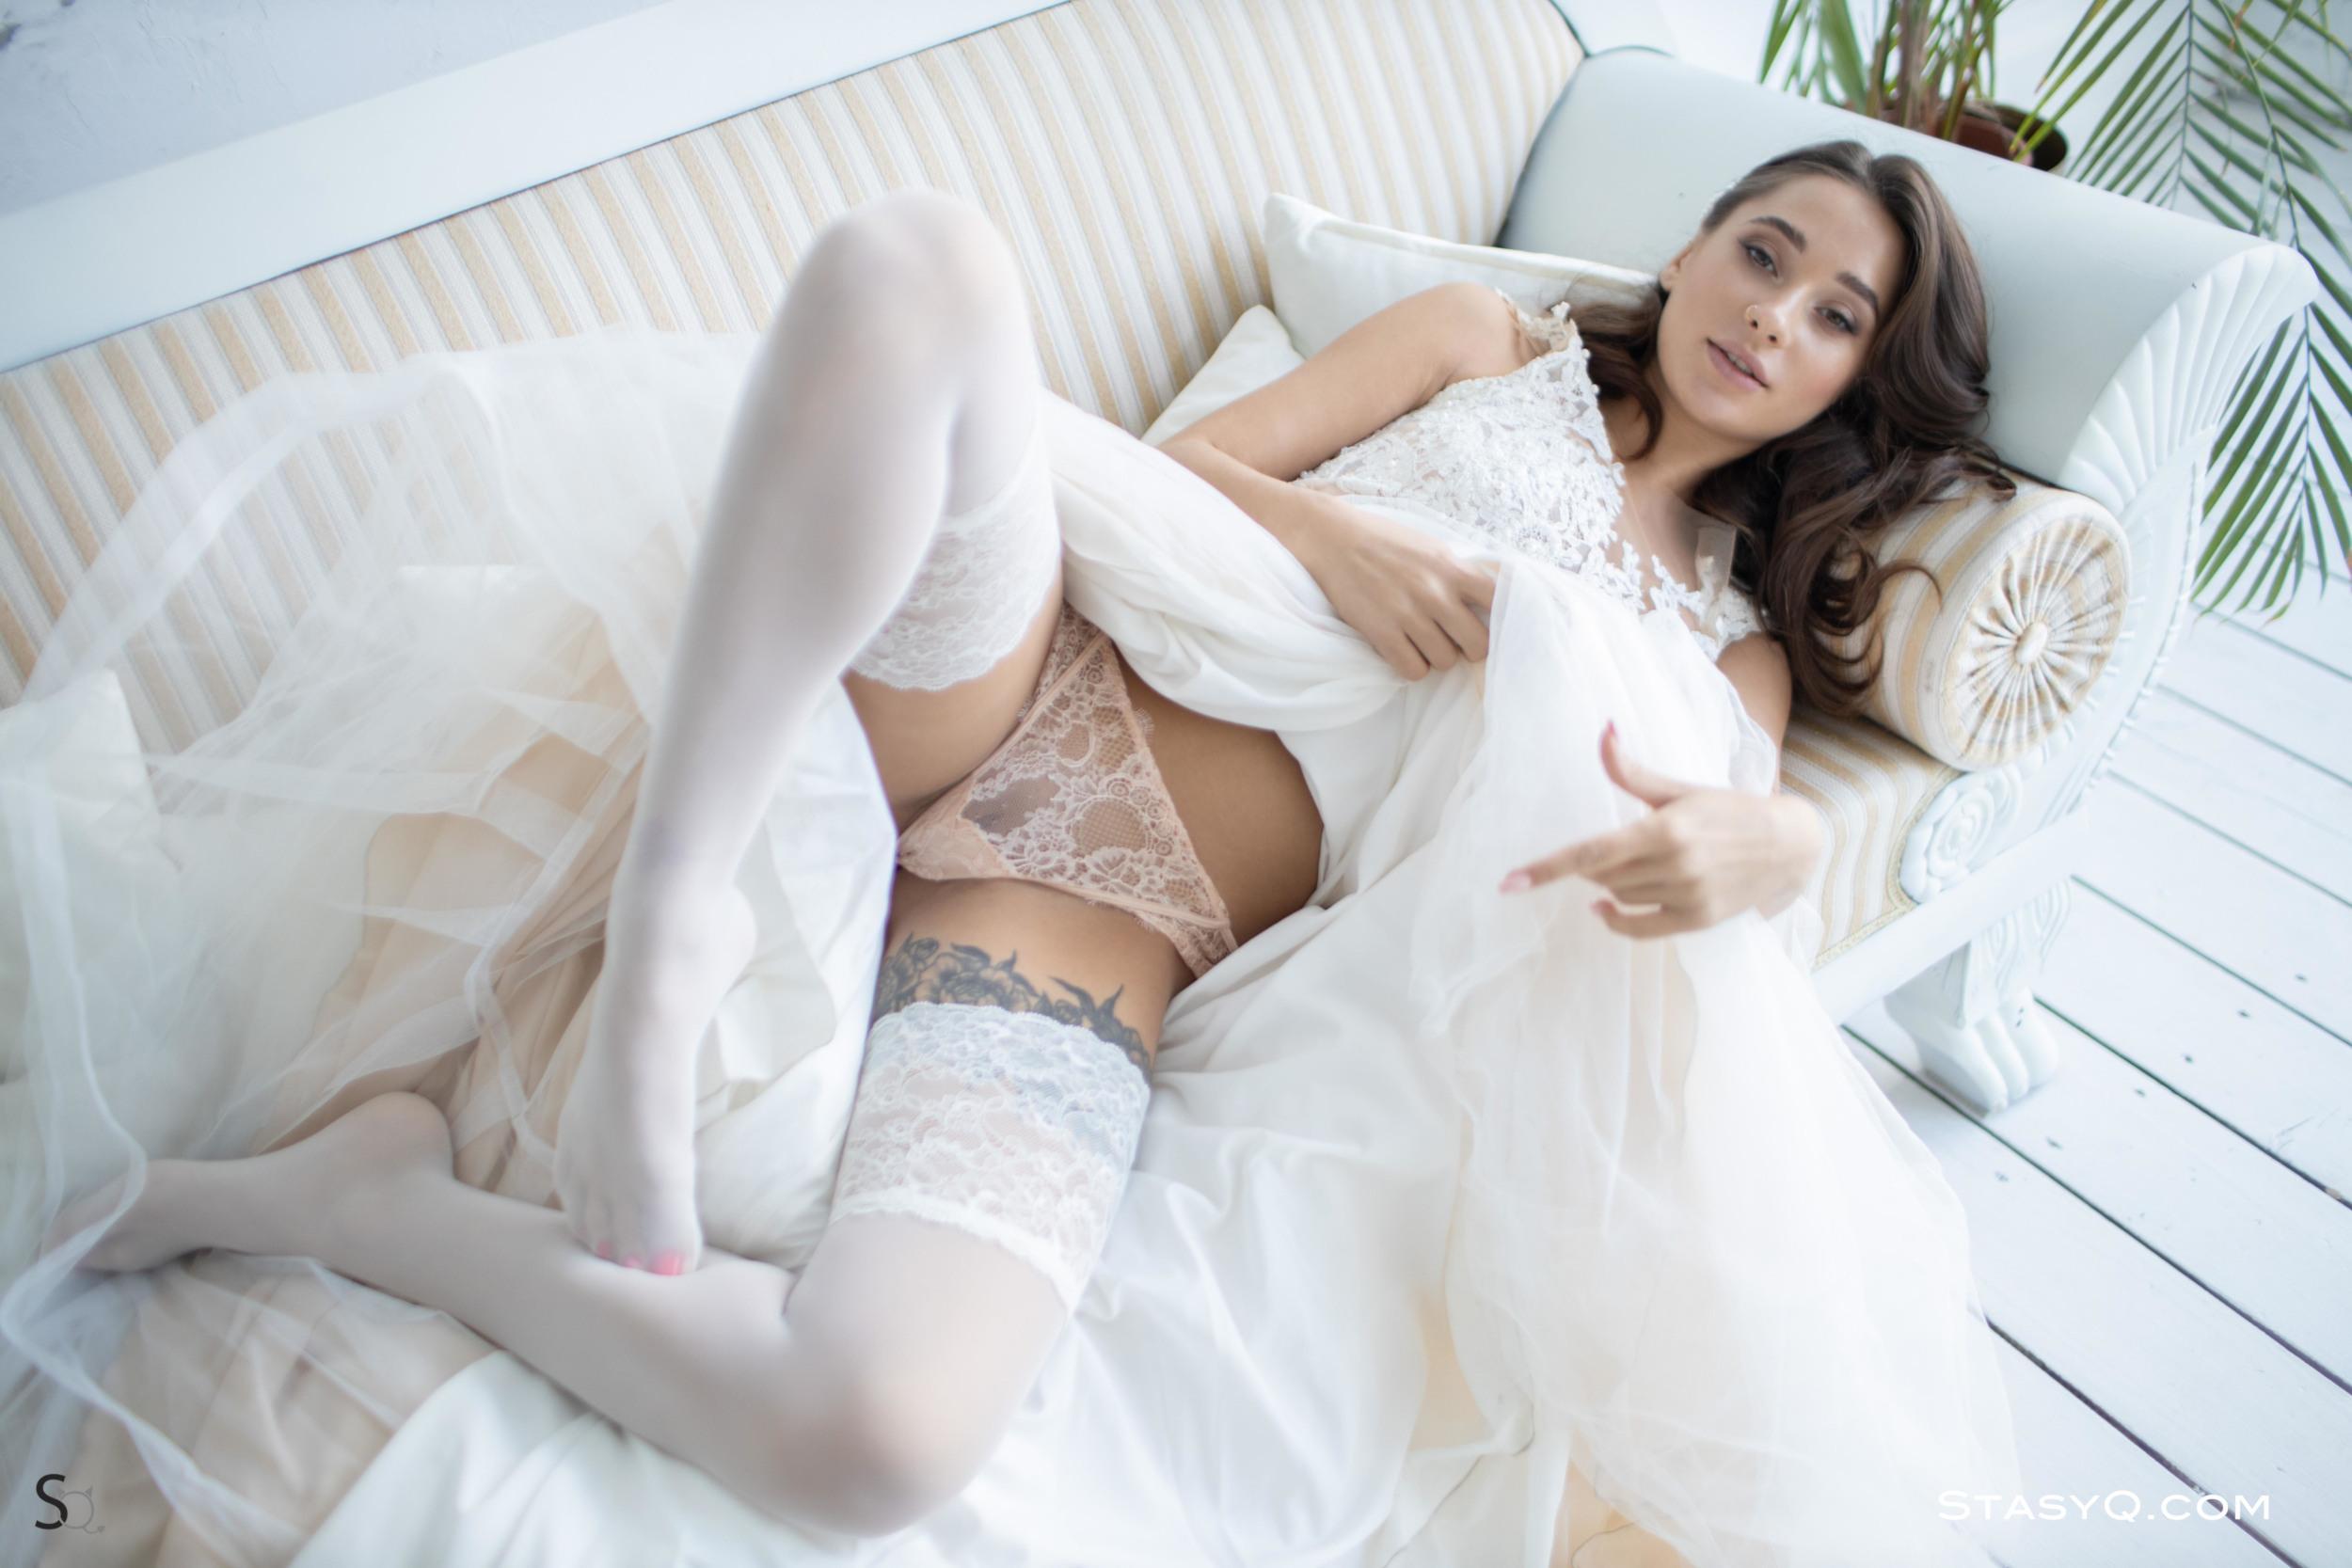 Kristina-Scherbinina-Liya-Silver-by-Said-Energizer-Stasy-Q-II-12